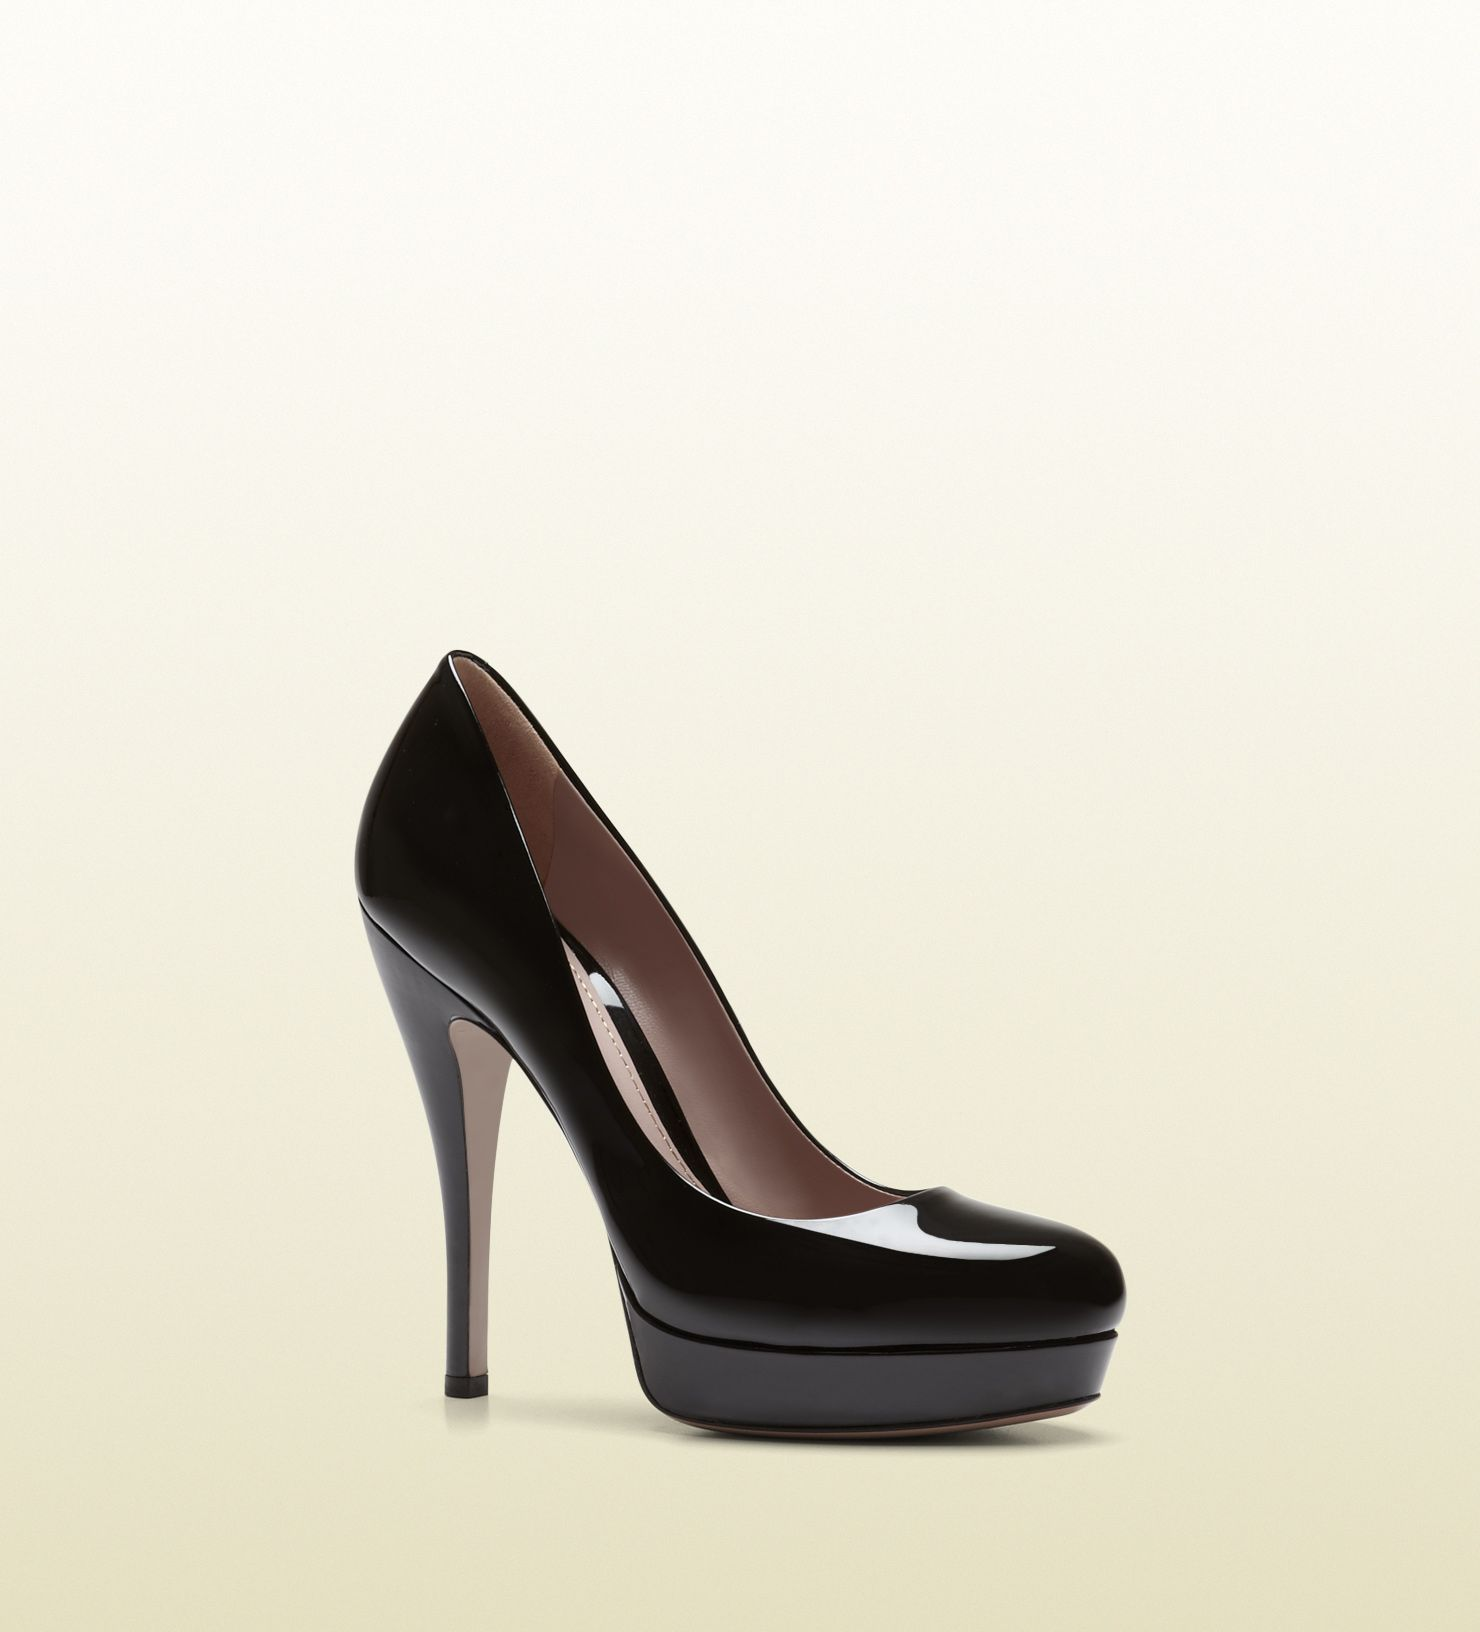 40e1a930c44 Gucci black patent leather platform pump Fall 2013